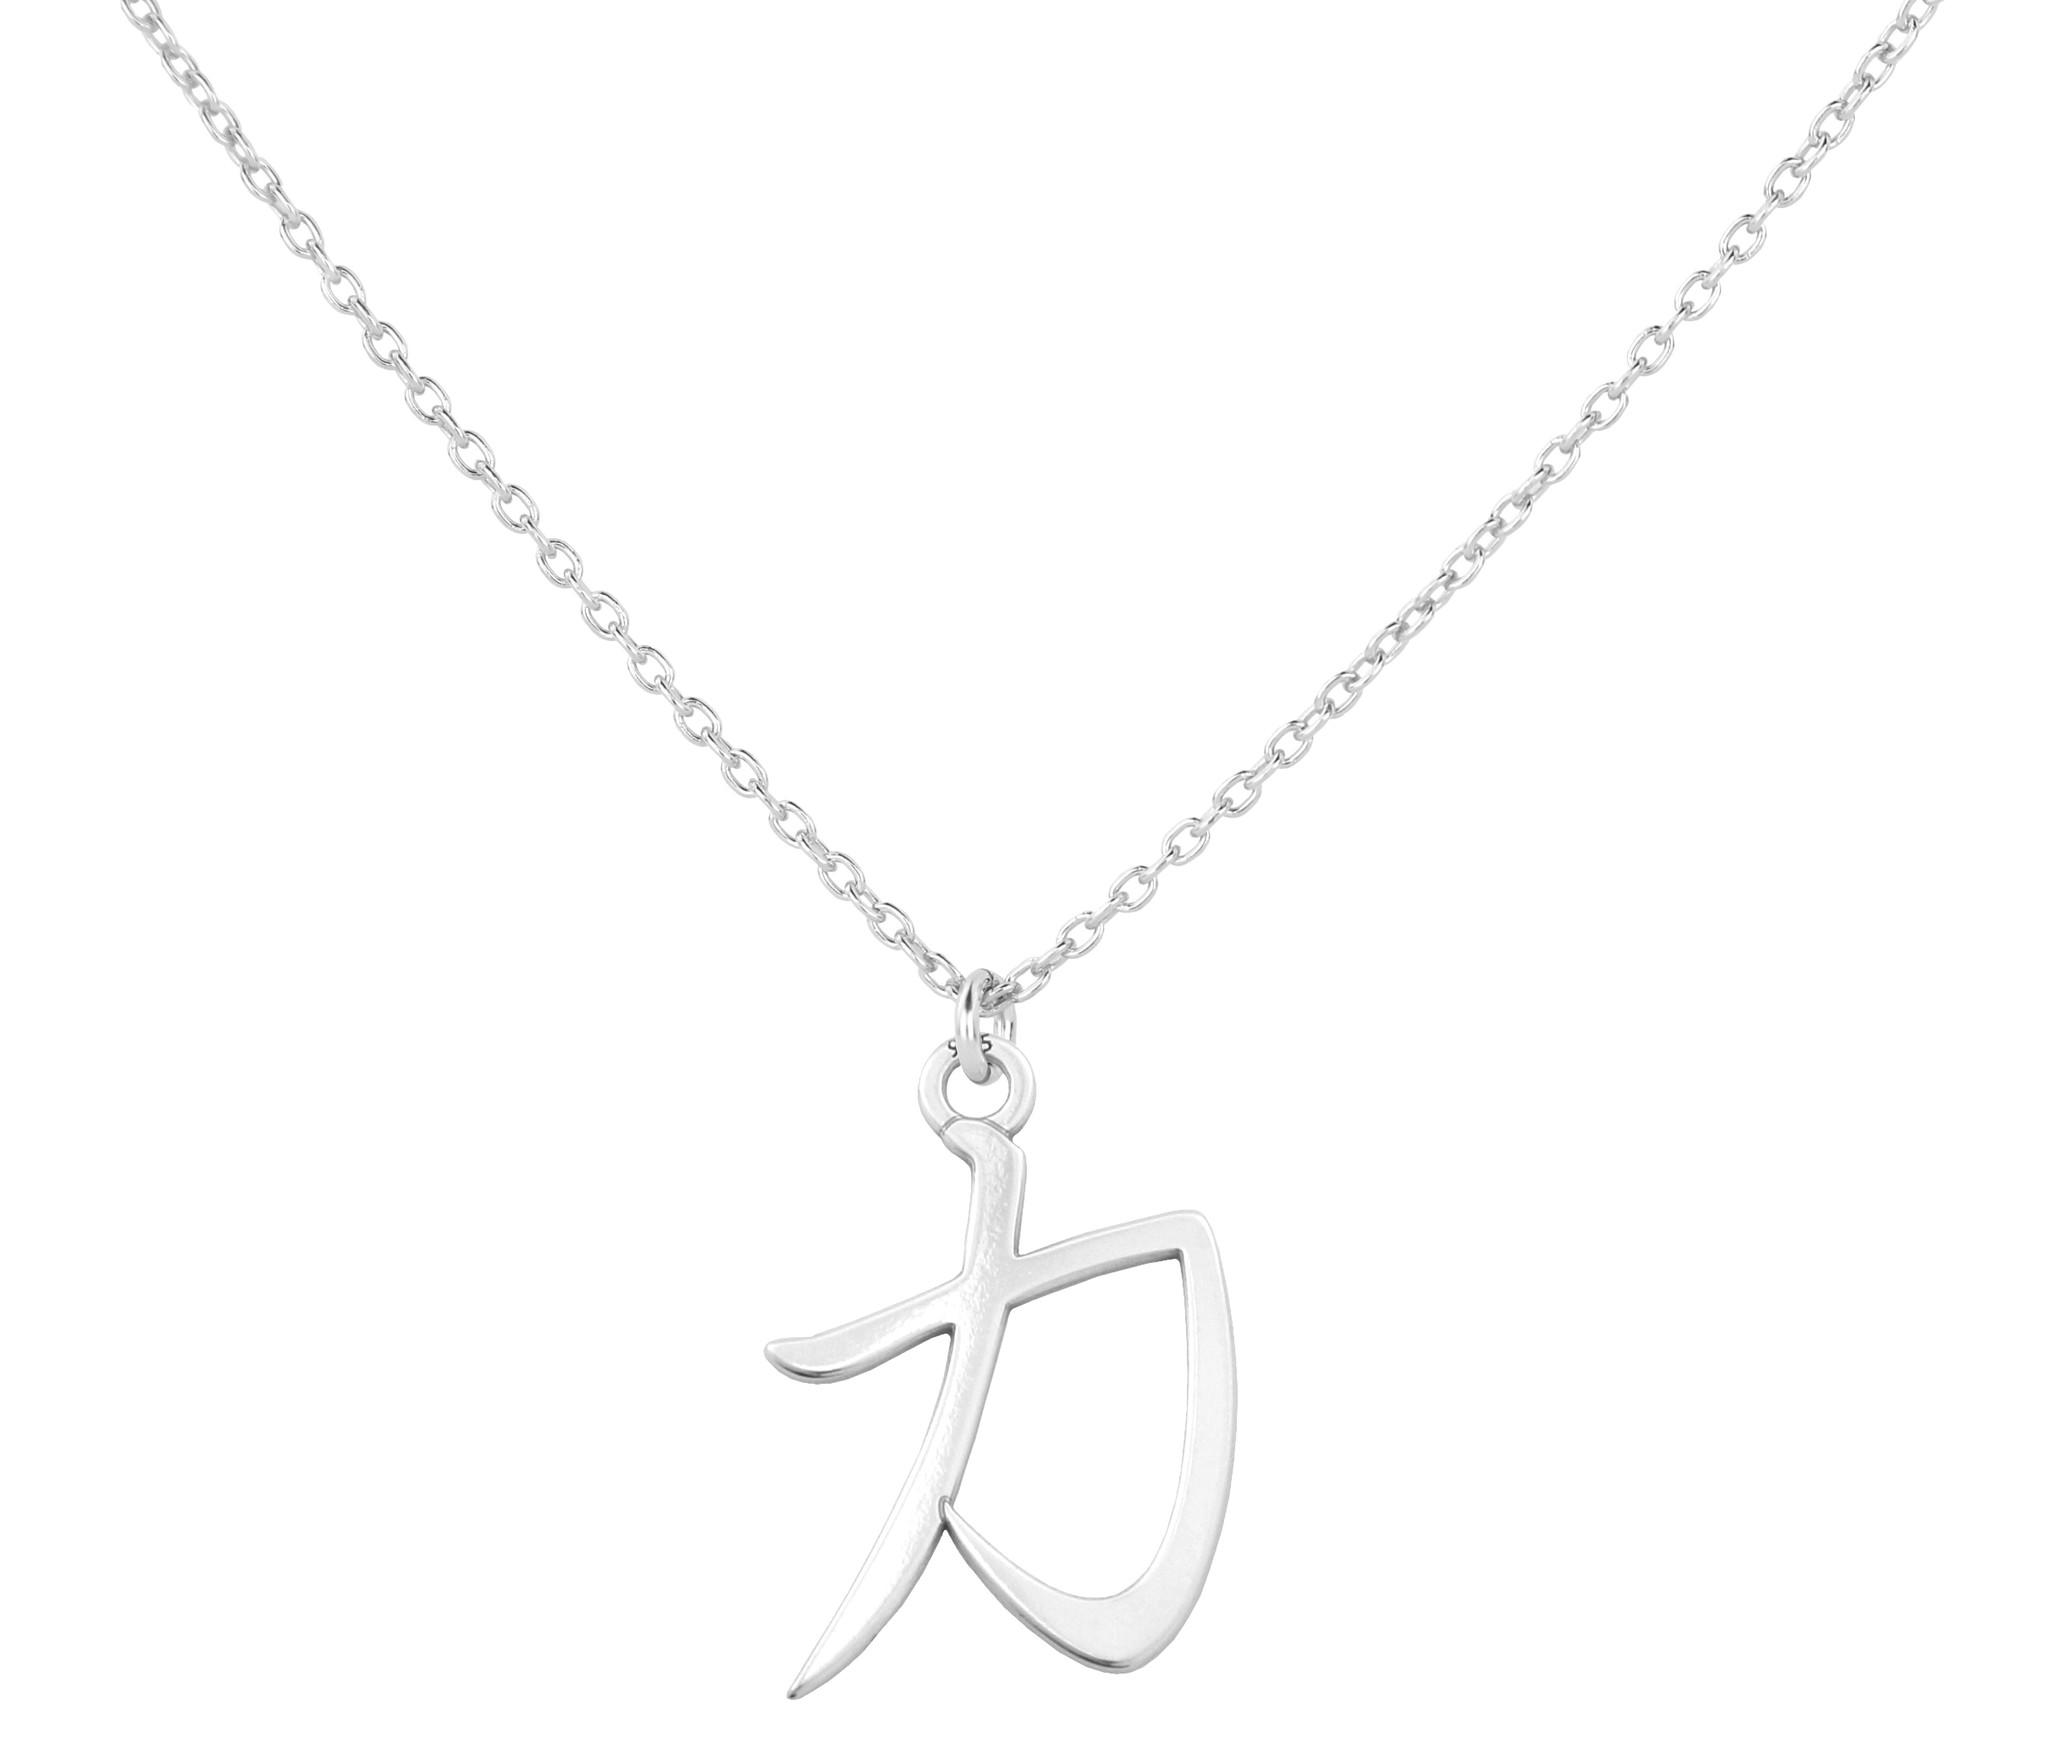 Necklace Japanese Strength Symbol Sterling Silver Arlizi 1725 Arlizi Jewelry Webshop